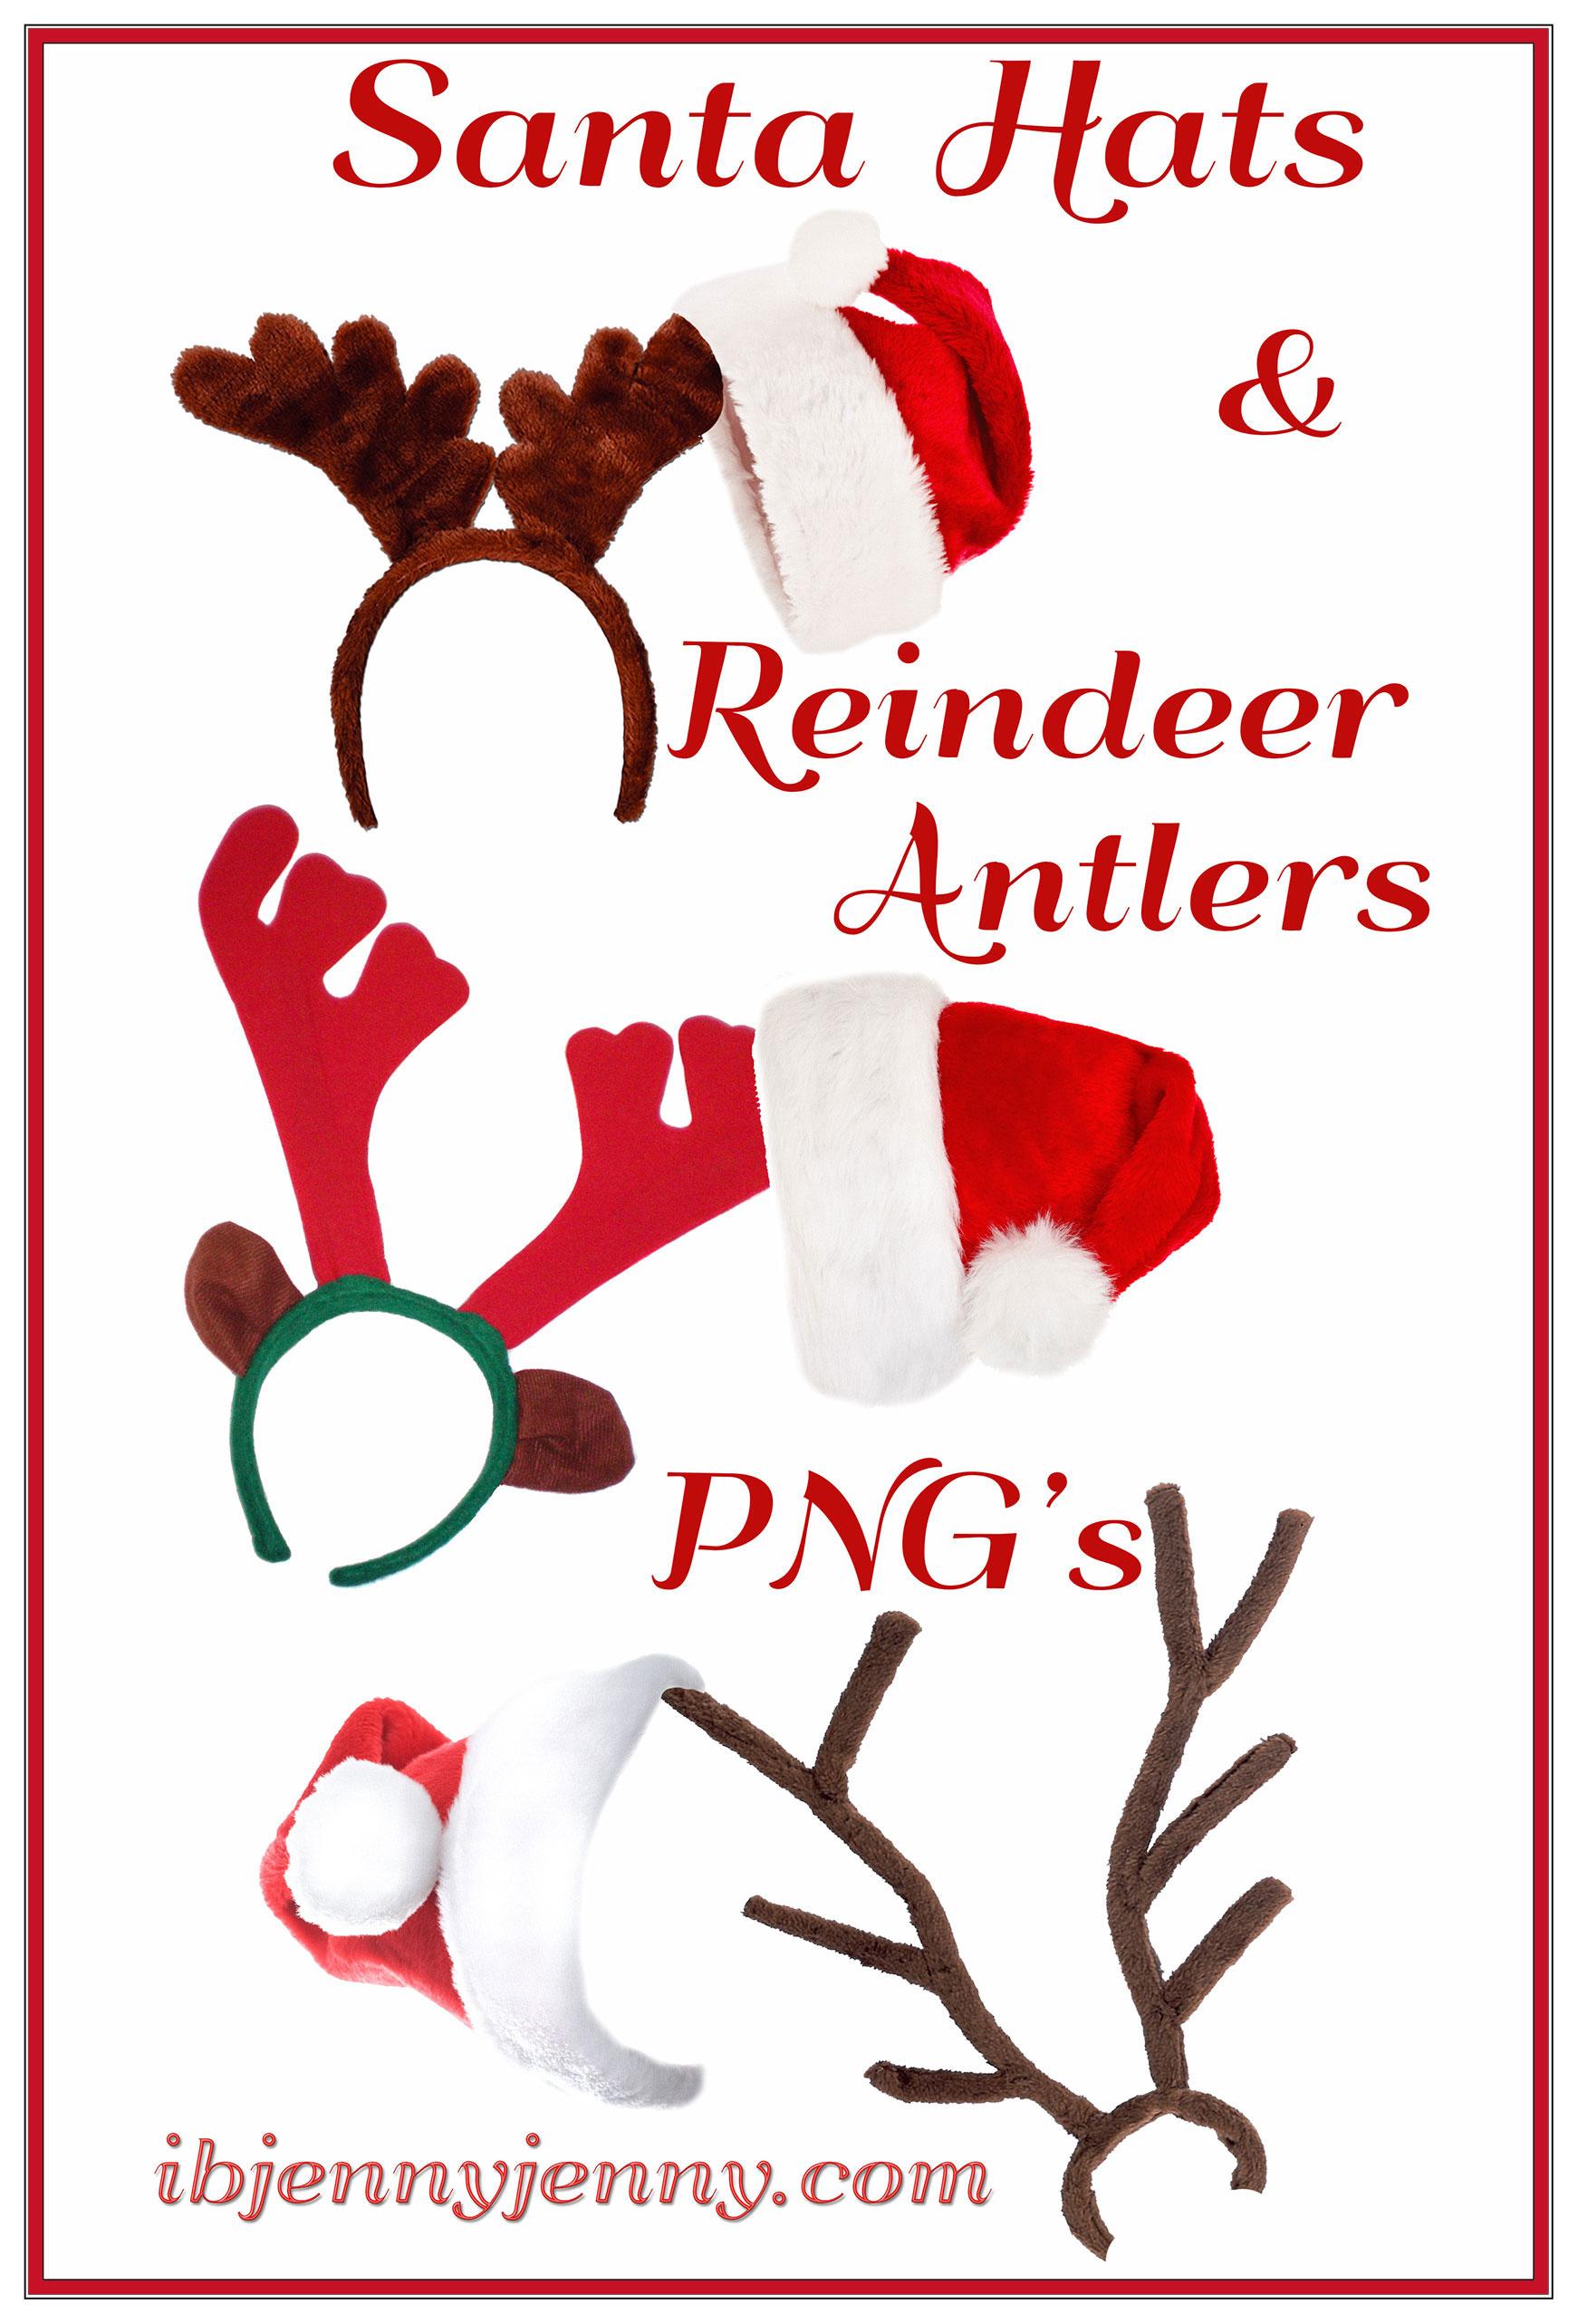 . PlusPng.com Santa Hats and Reindeer Antlers PNGu0027s by ibjennyjenny - Reindeer Antlers PNG